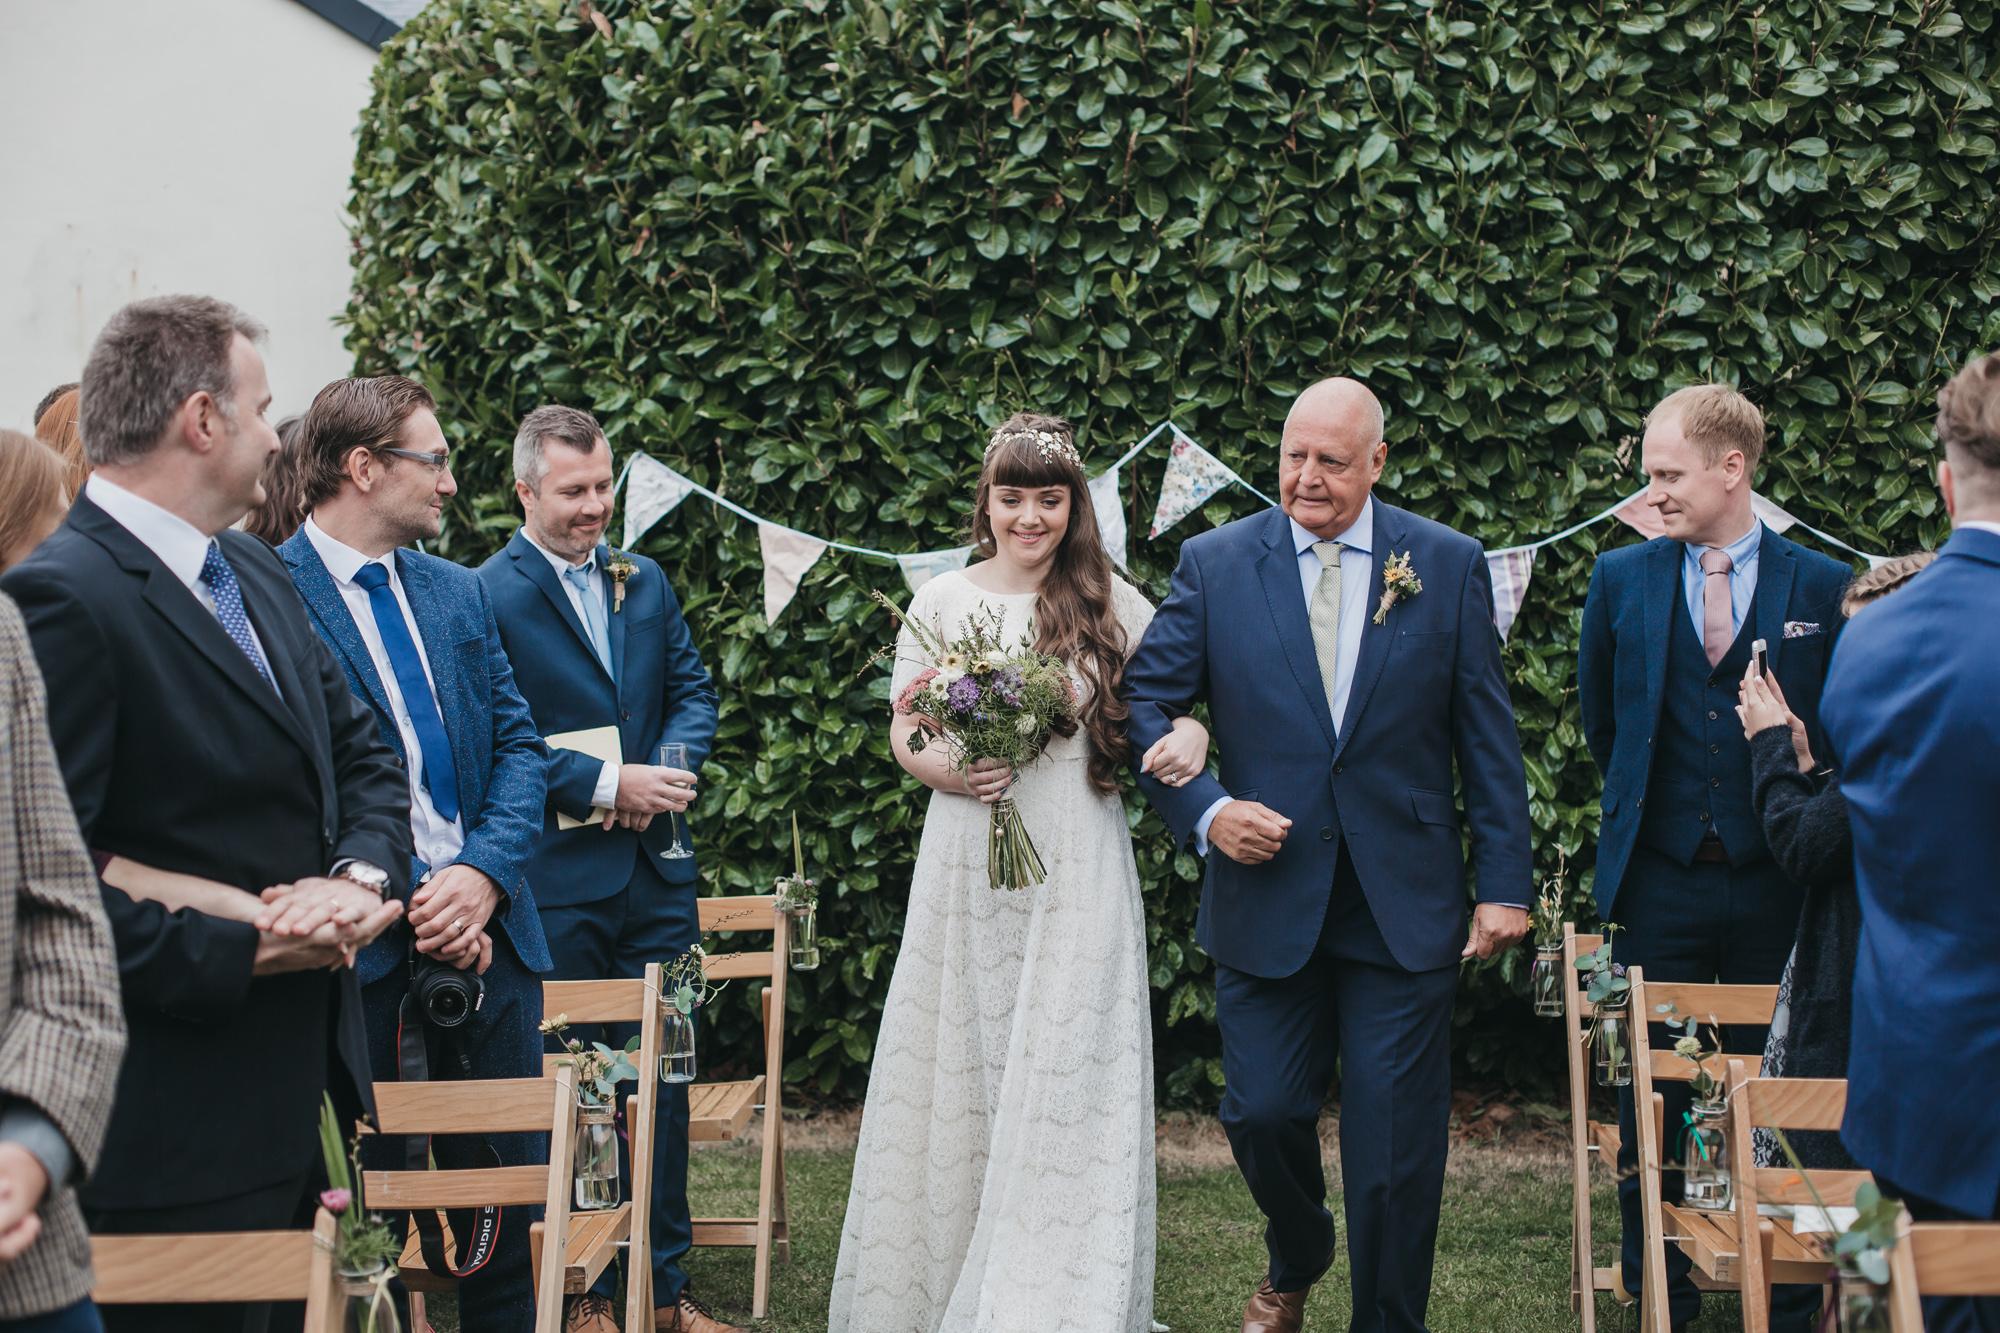 Kristy-Back-Garden-Outdoor-Wedding-Sheffield-Industrial-Warehouse-Wedding-Bohemian-Kate-Beaumont-Dahlia-Dress-8.jpg